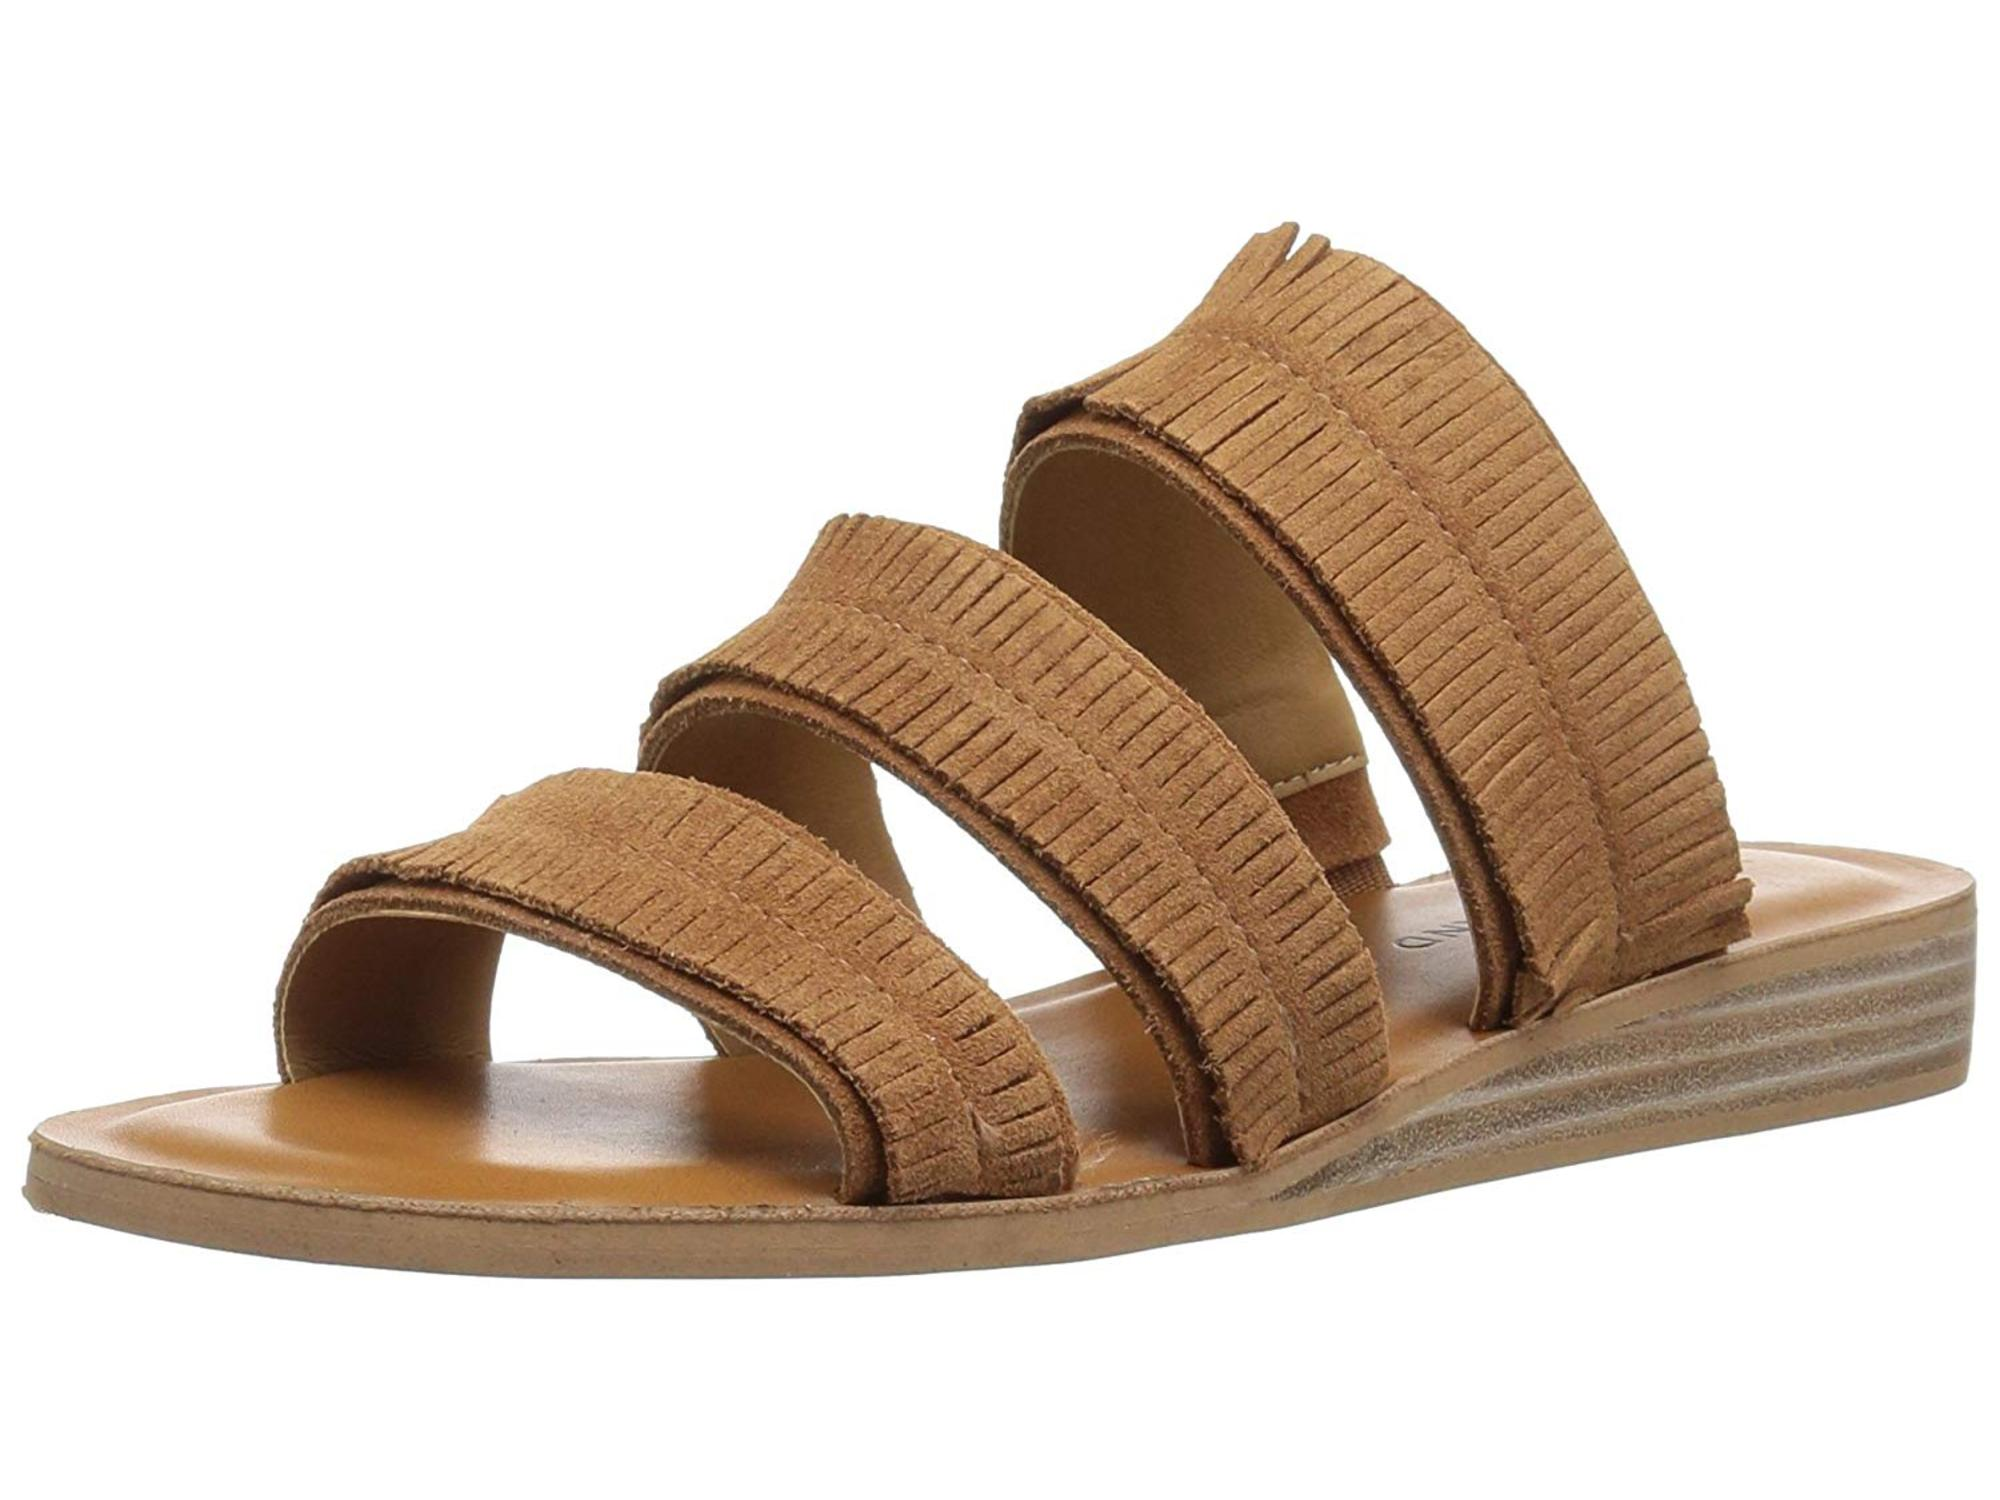 4a9a43511da Lucky Brand Womens Hegen Leather Open Toe Casual Slide